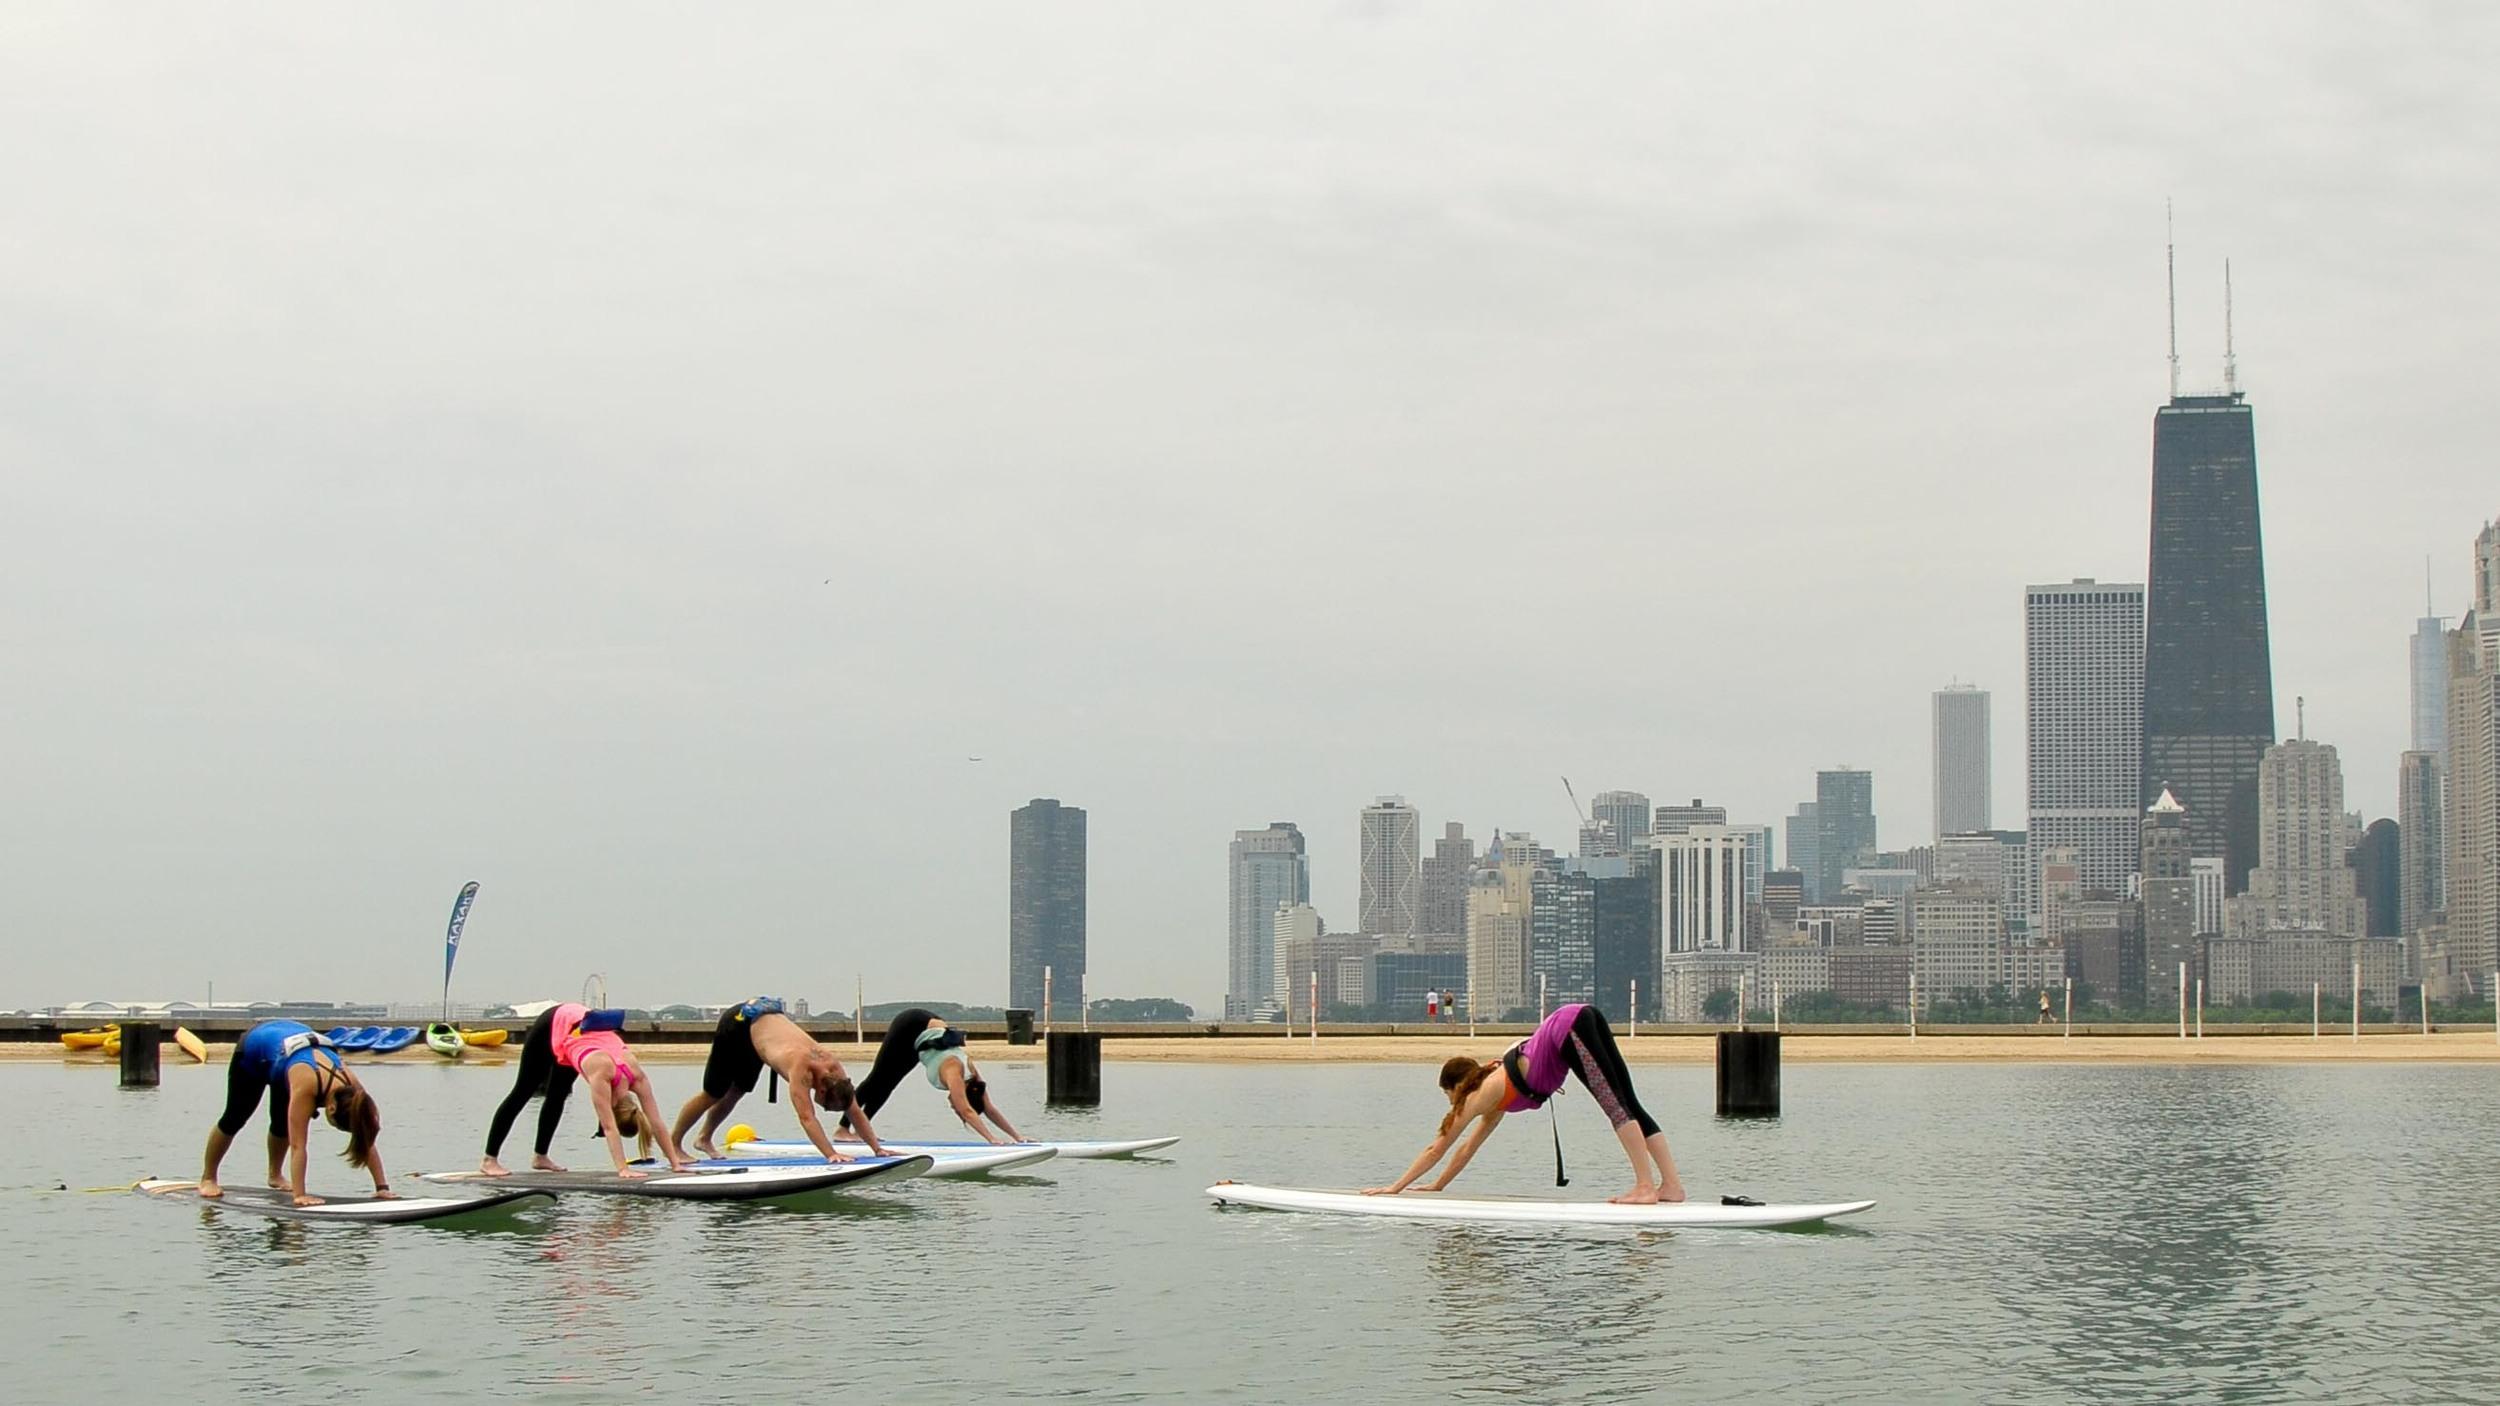 ChicagoSUP Yoga Fitness Photo (9 of 9).jpg